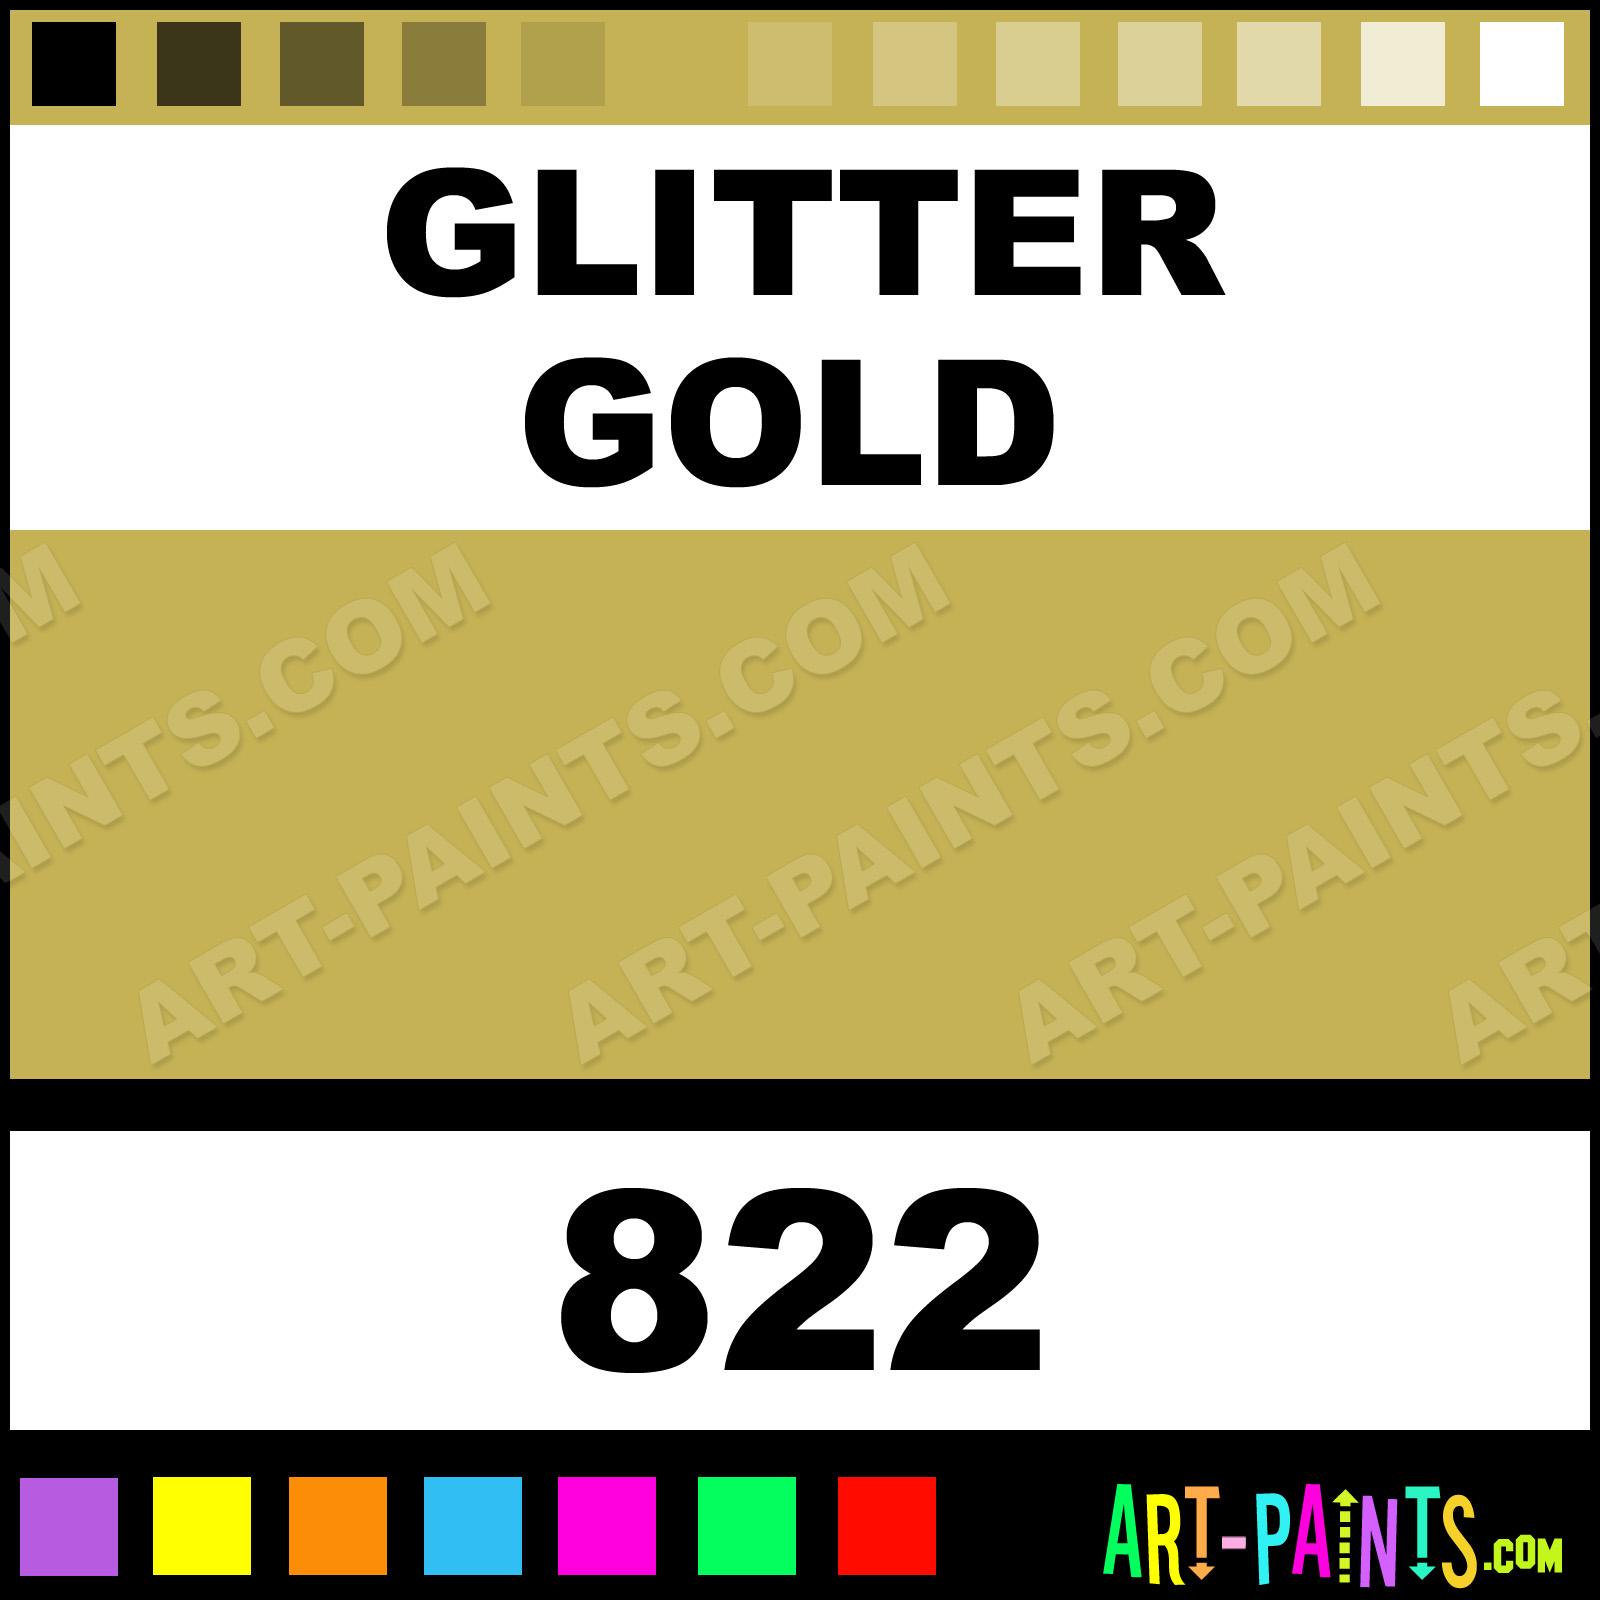 Glitter Gold Fabric Spray Paints Aerosol Decorative